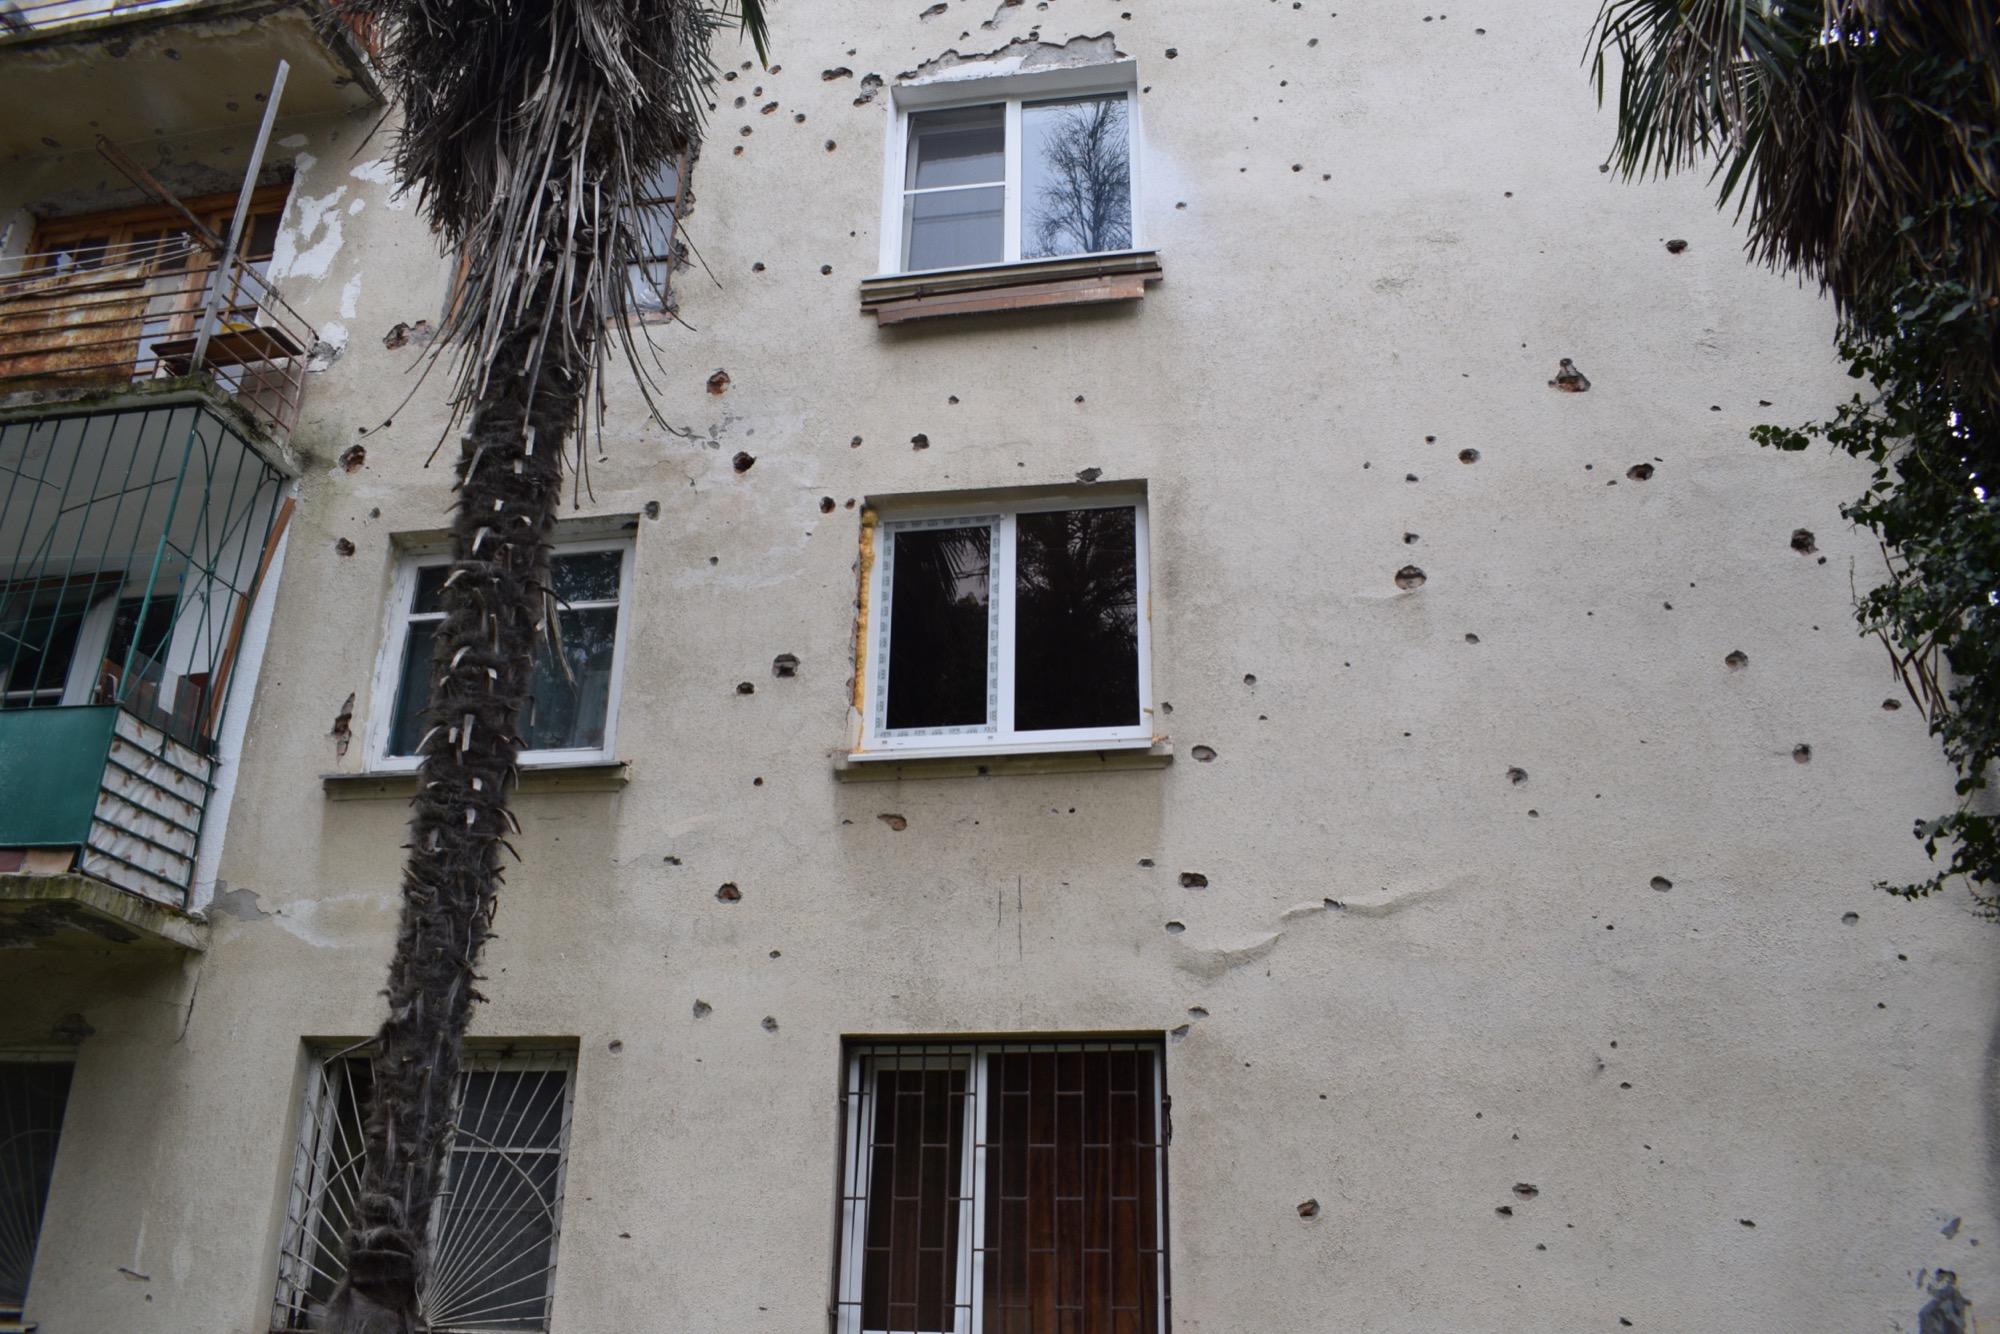 holes from bullets.JPG bneGeneric Russia Abkhazia Filip Brokes 5